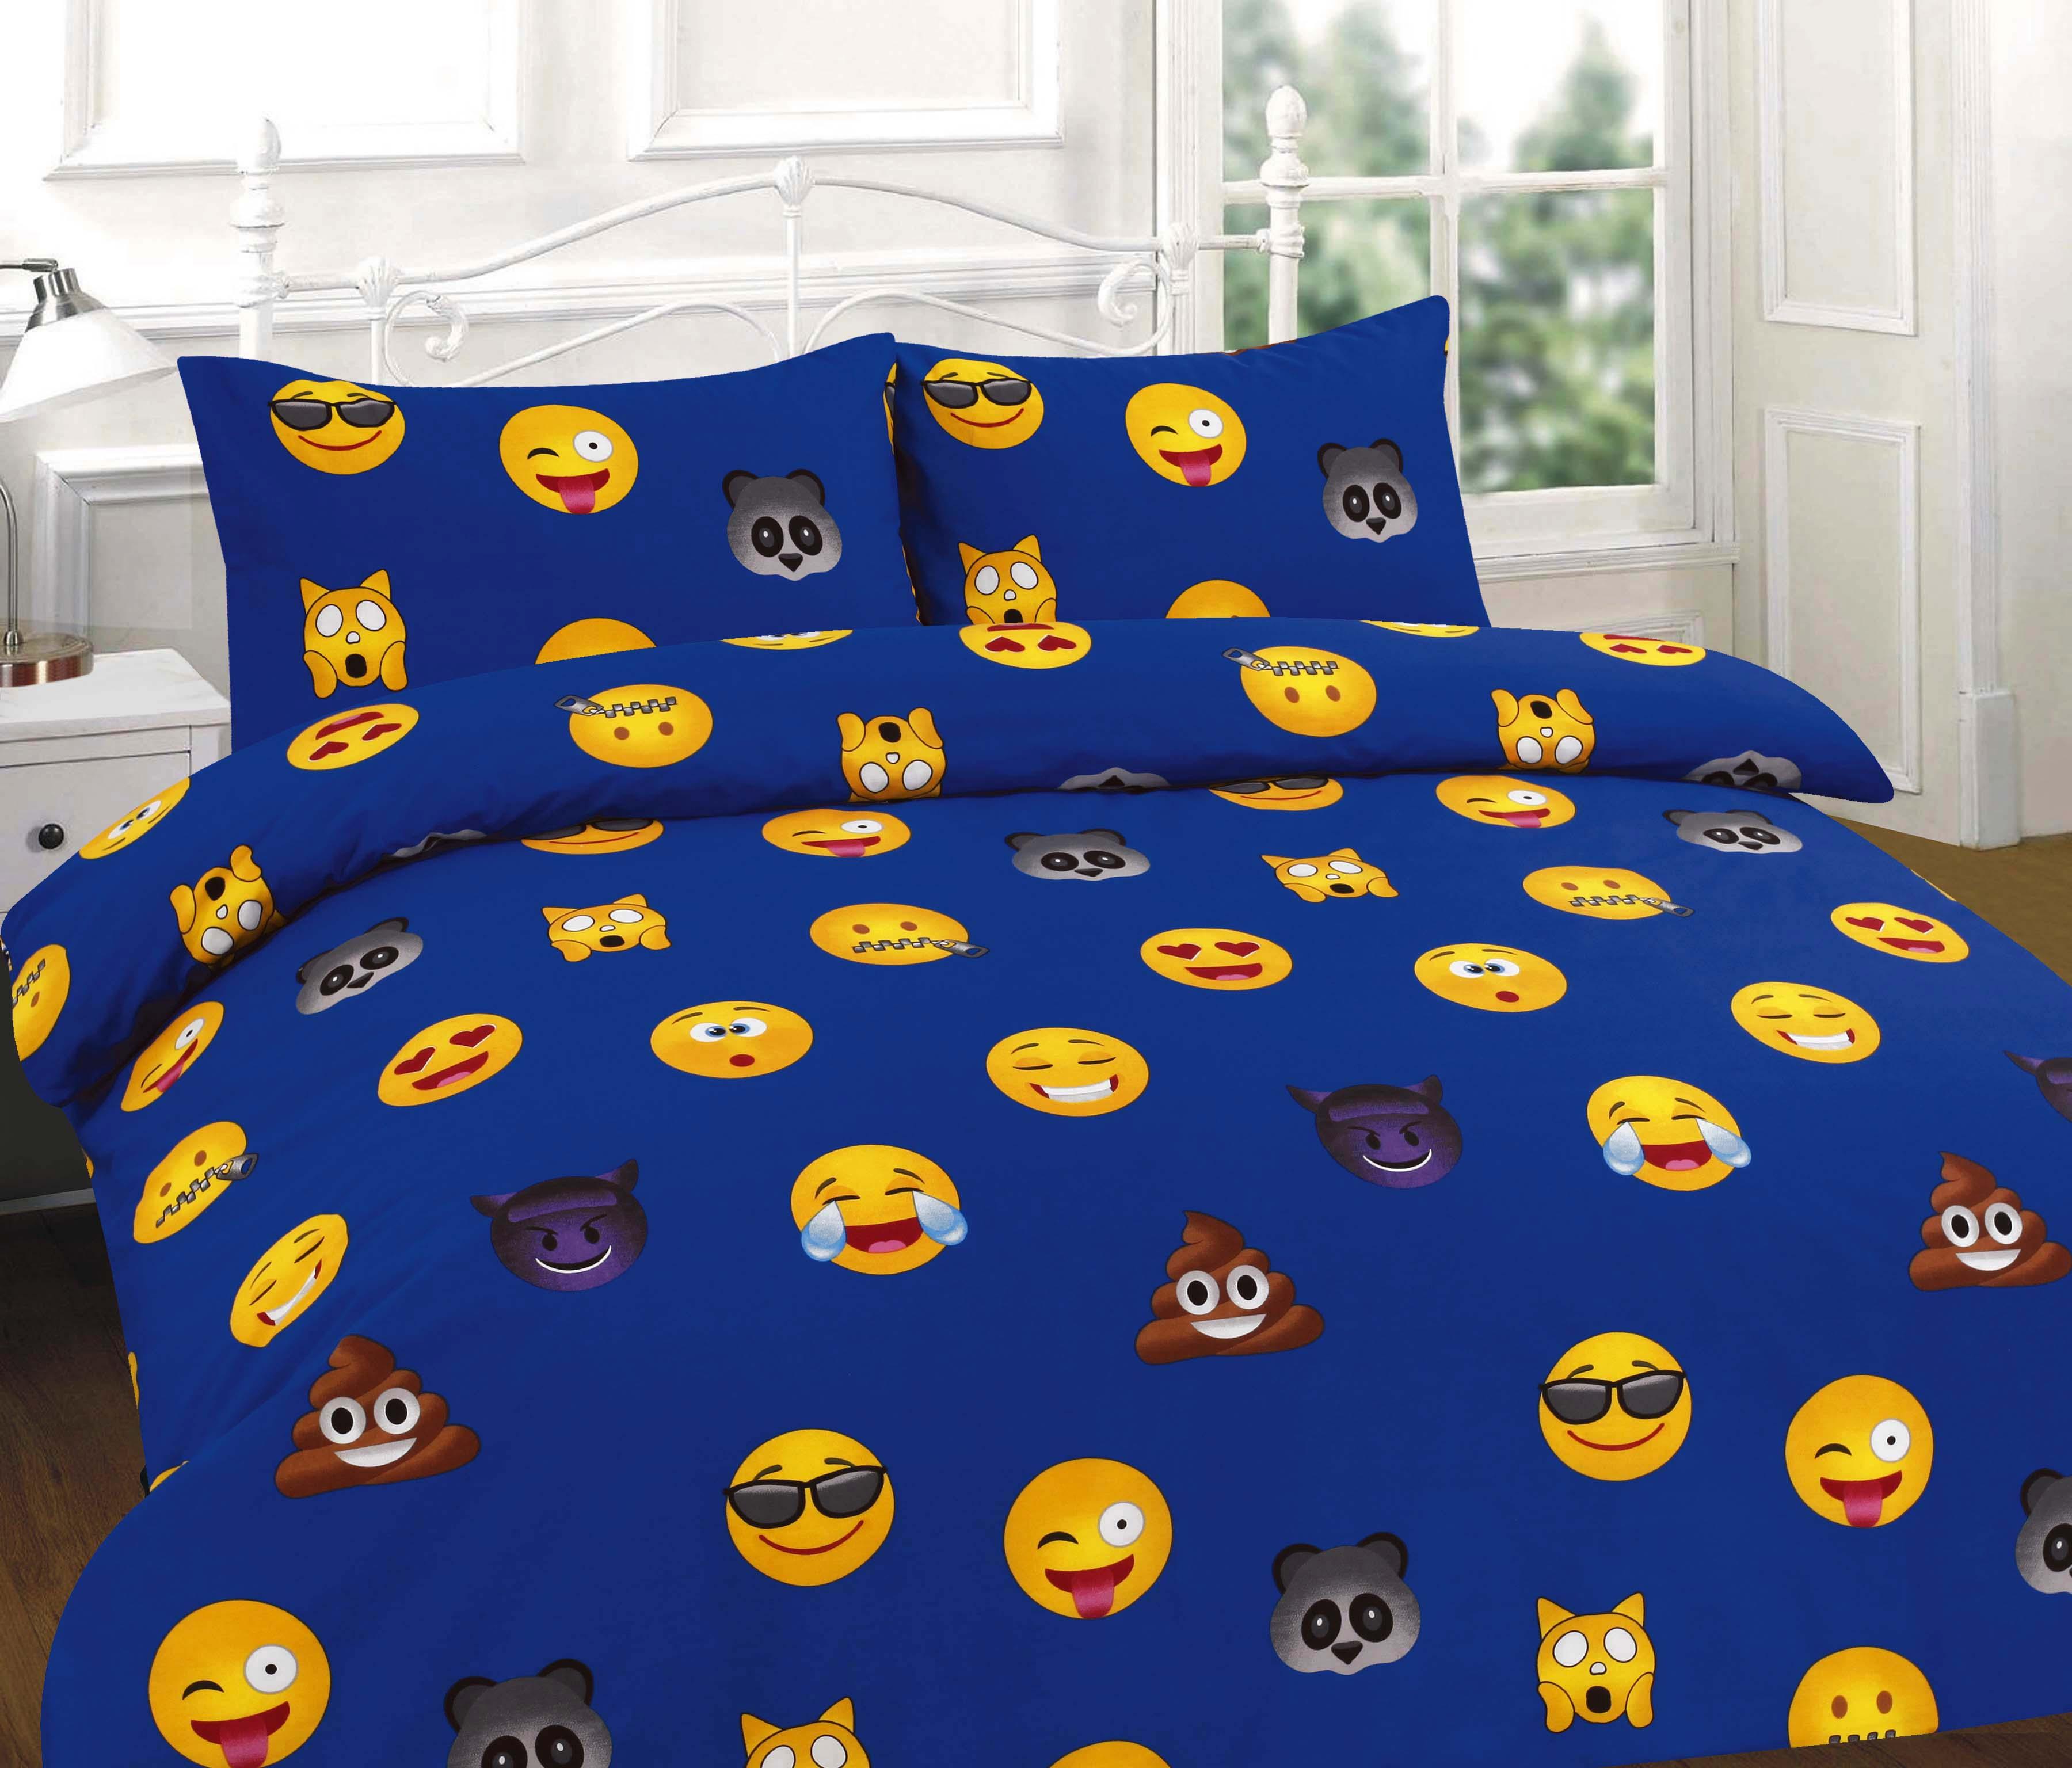 Emoji Multi Emotions Smiley Screaming Poo Panda Devil